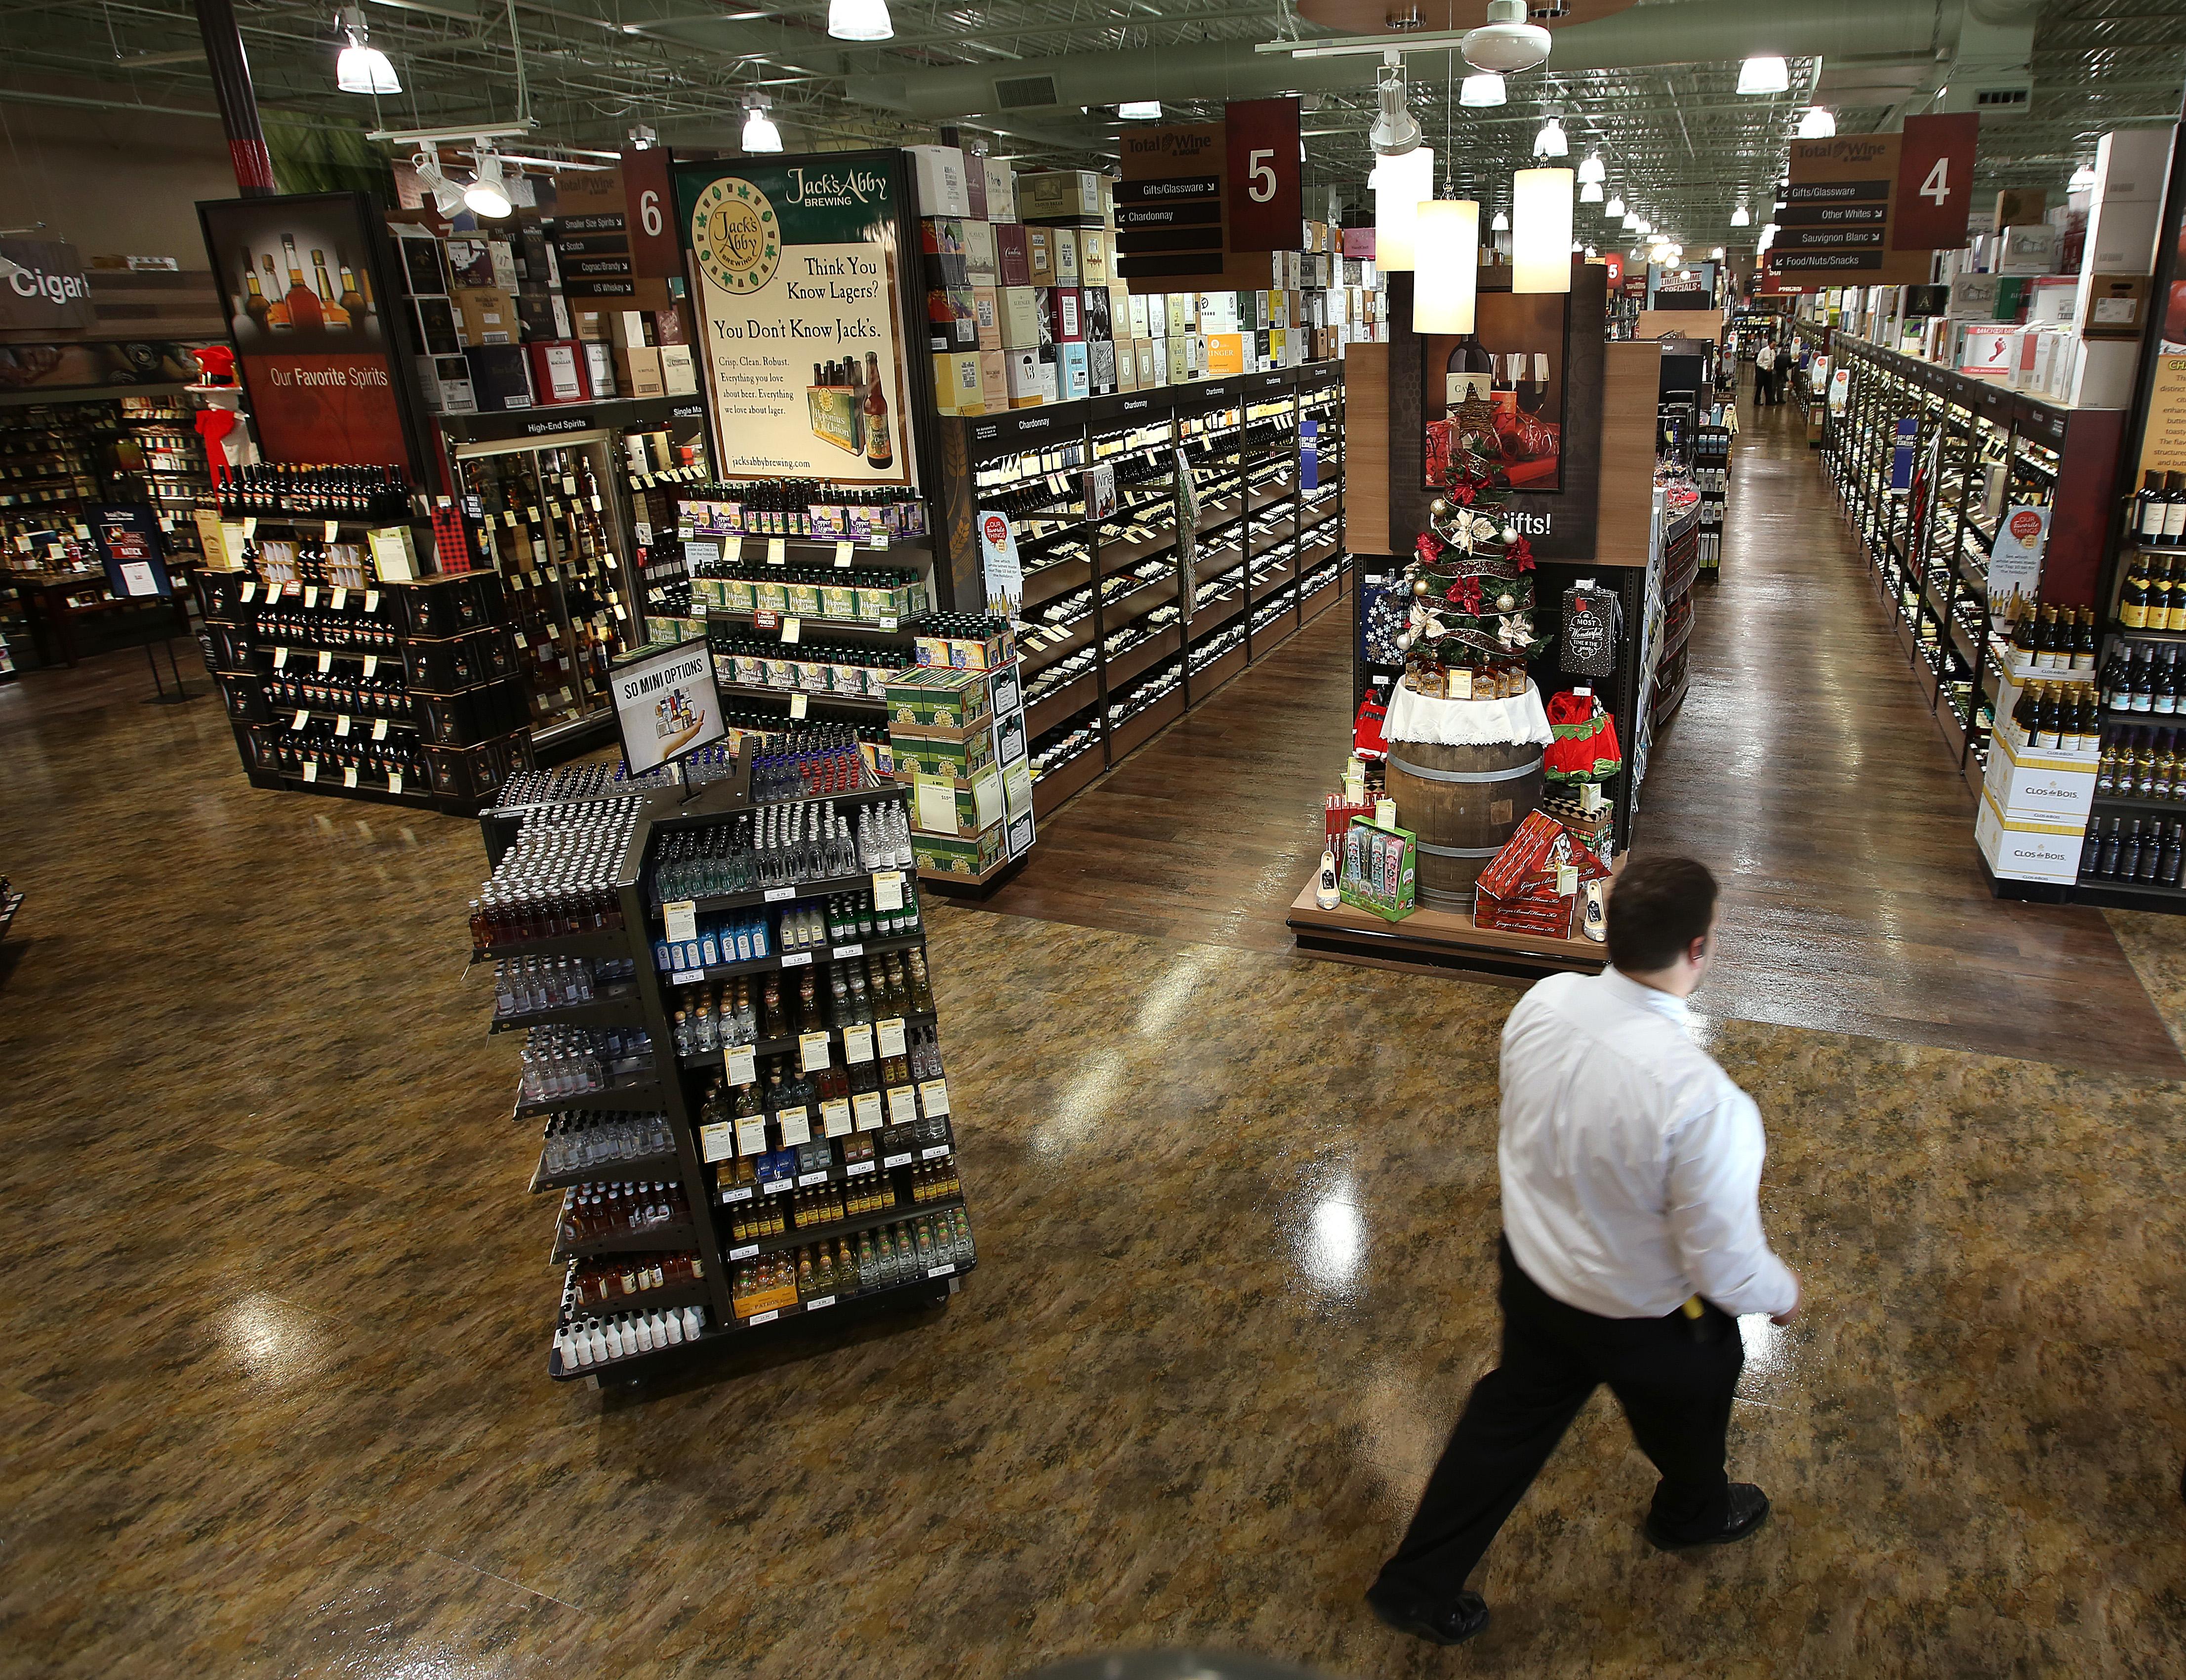 Super-cheap booze at Total Wine fuels pricing fight - The Boston Globe